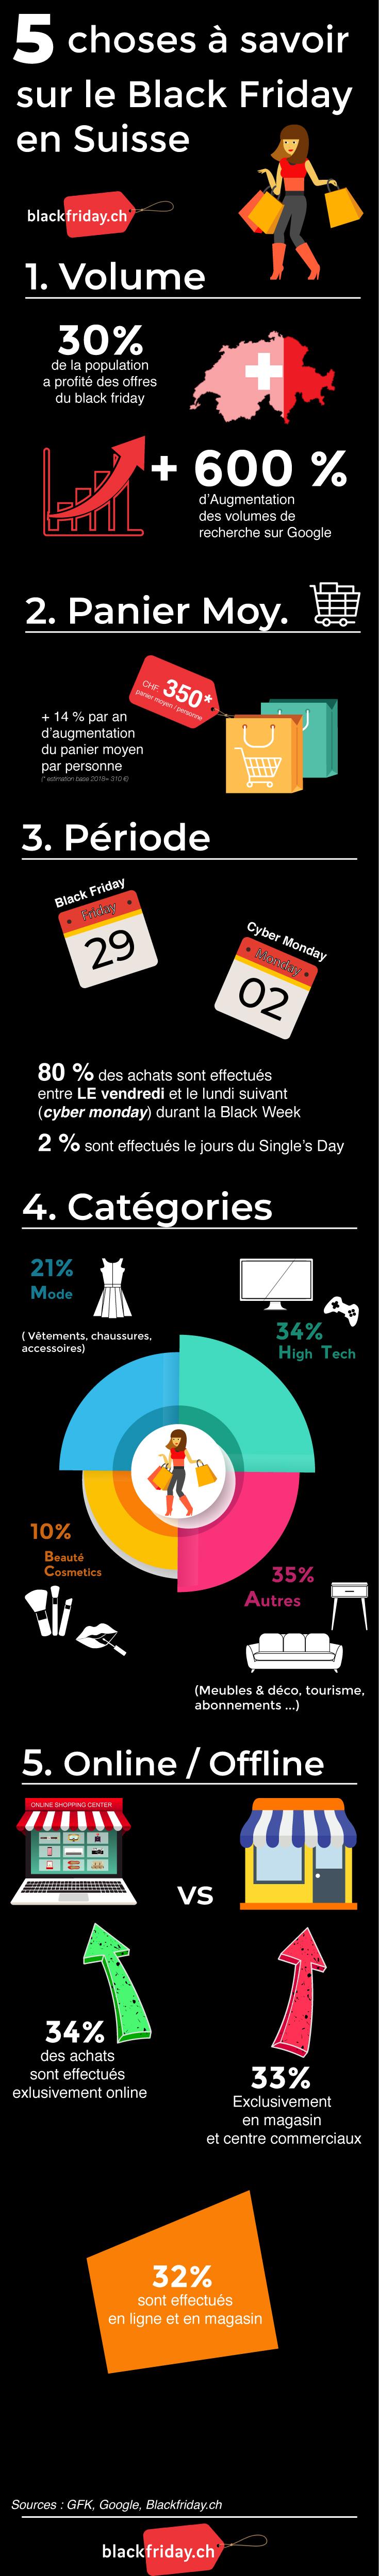 Infrographique du Black Friday